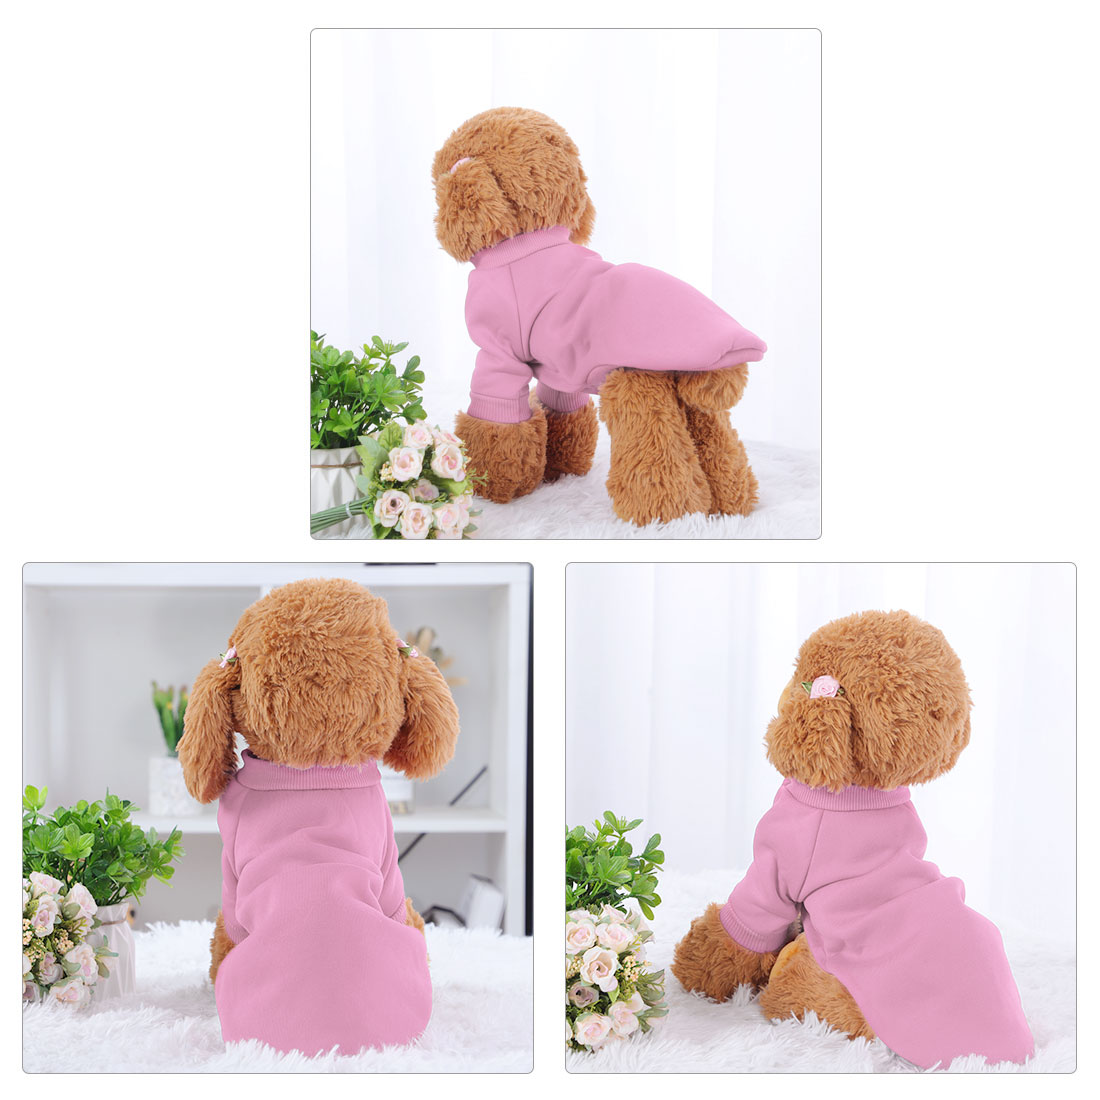 Cotton Blend Dog Winter Sweatshirt Pet Clothes Fleece Lined Warm Coat Pink XL - image 1 of 7